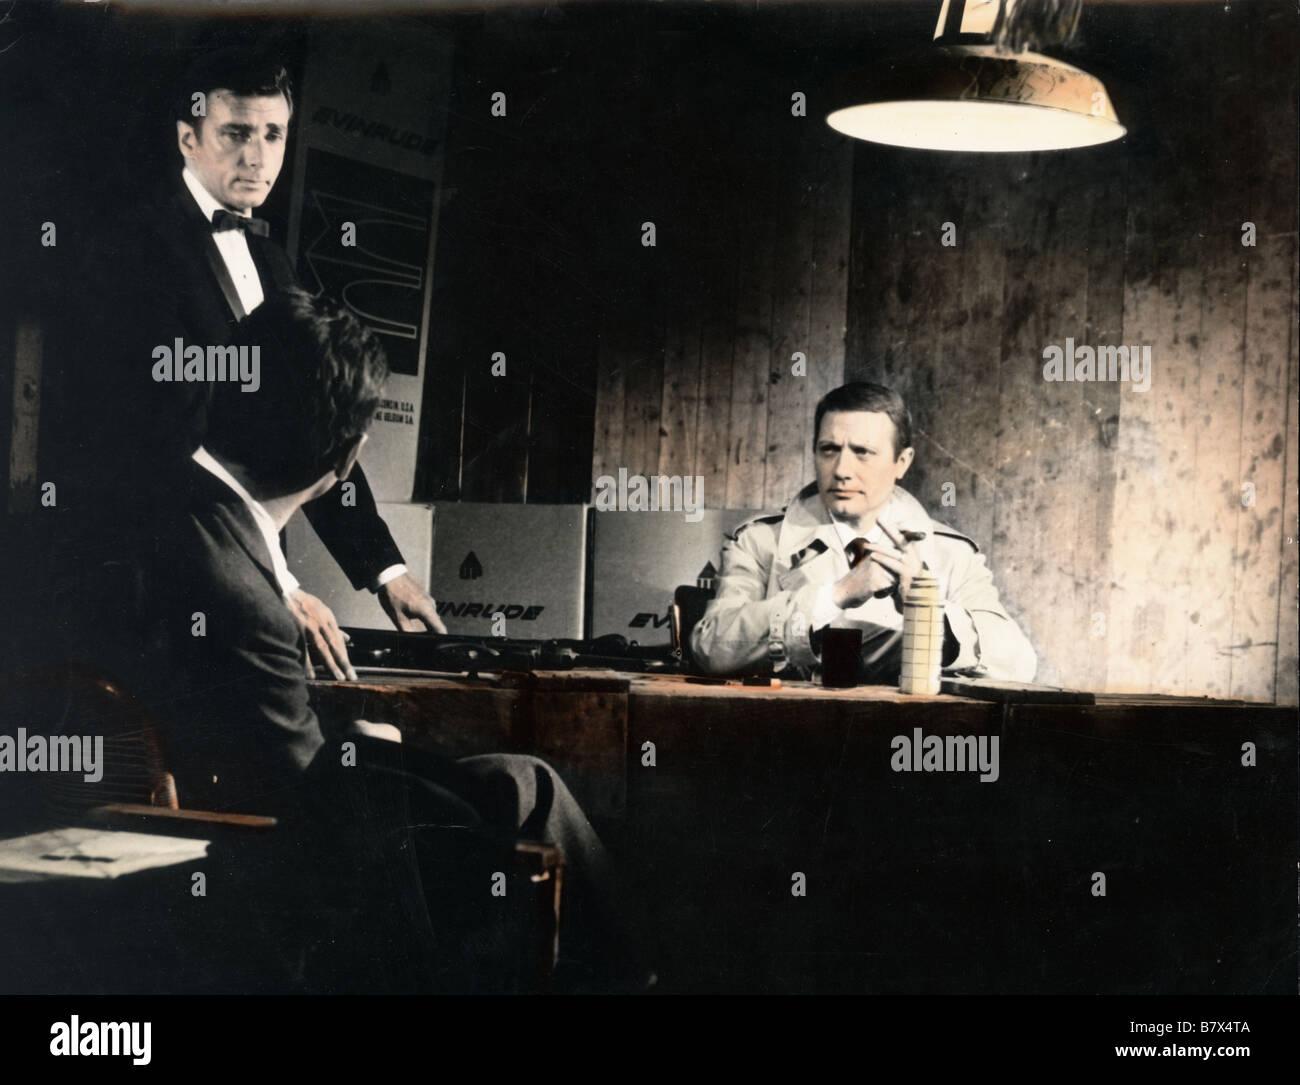 Coplan FX 18 casse tout  Year: 1965  Director: Riccardo Freda Jacques Dacqmine , Richard Wyler - Stock Image